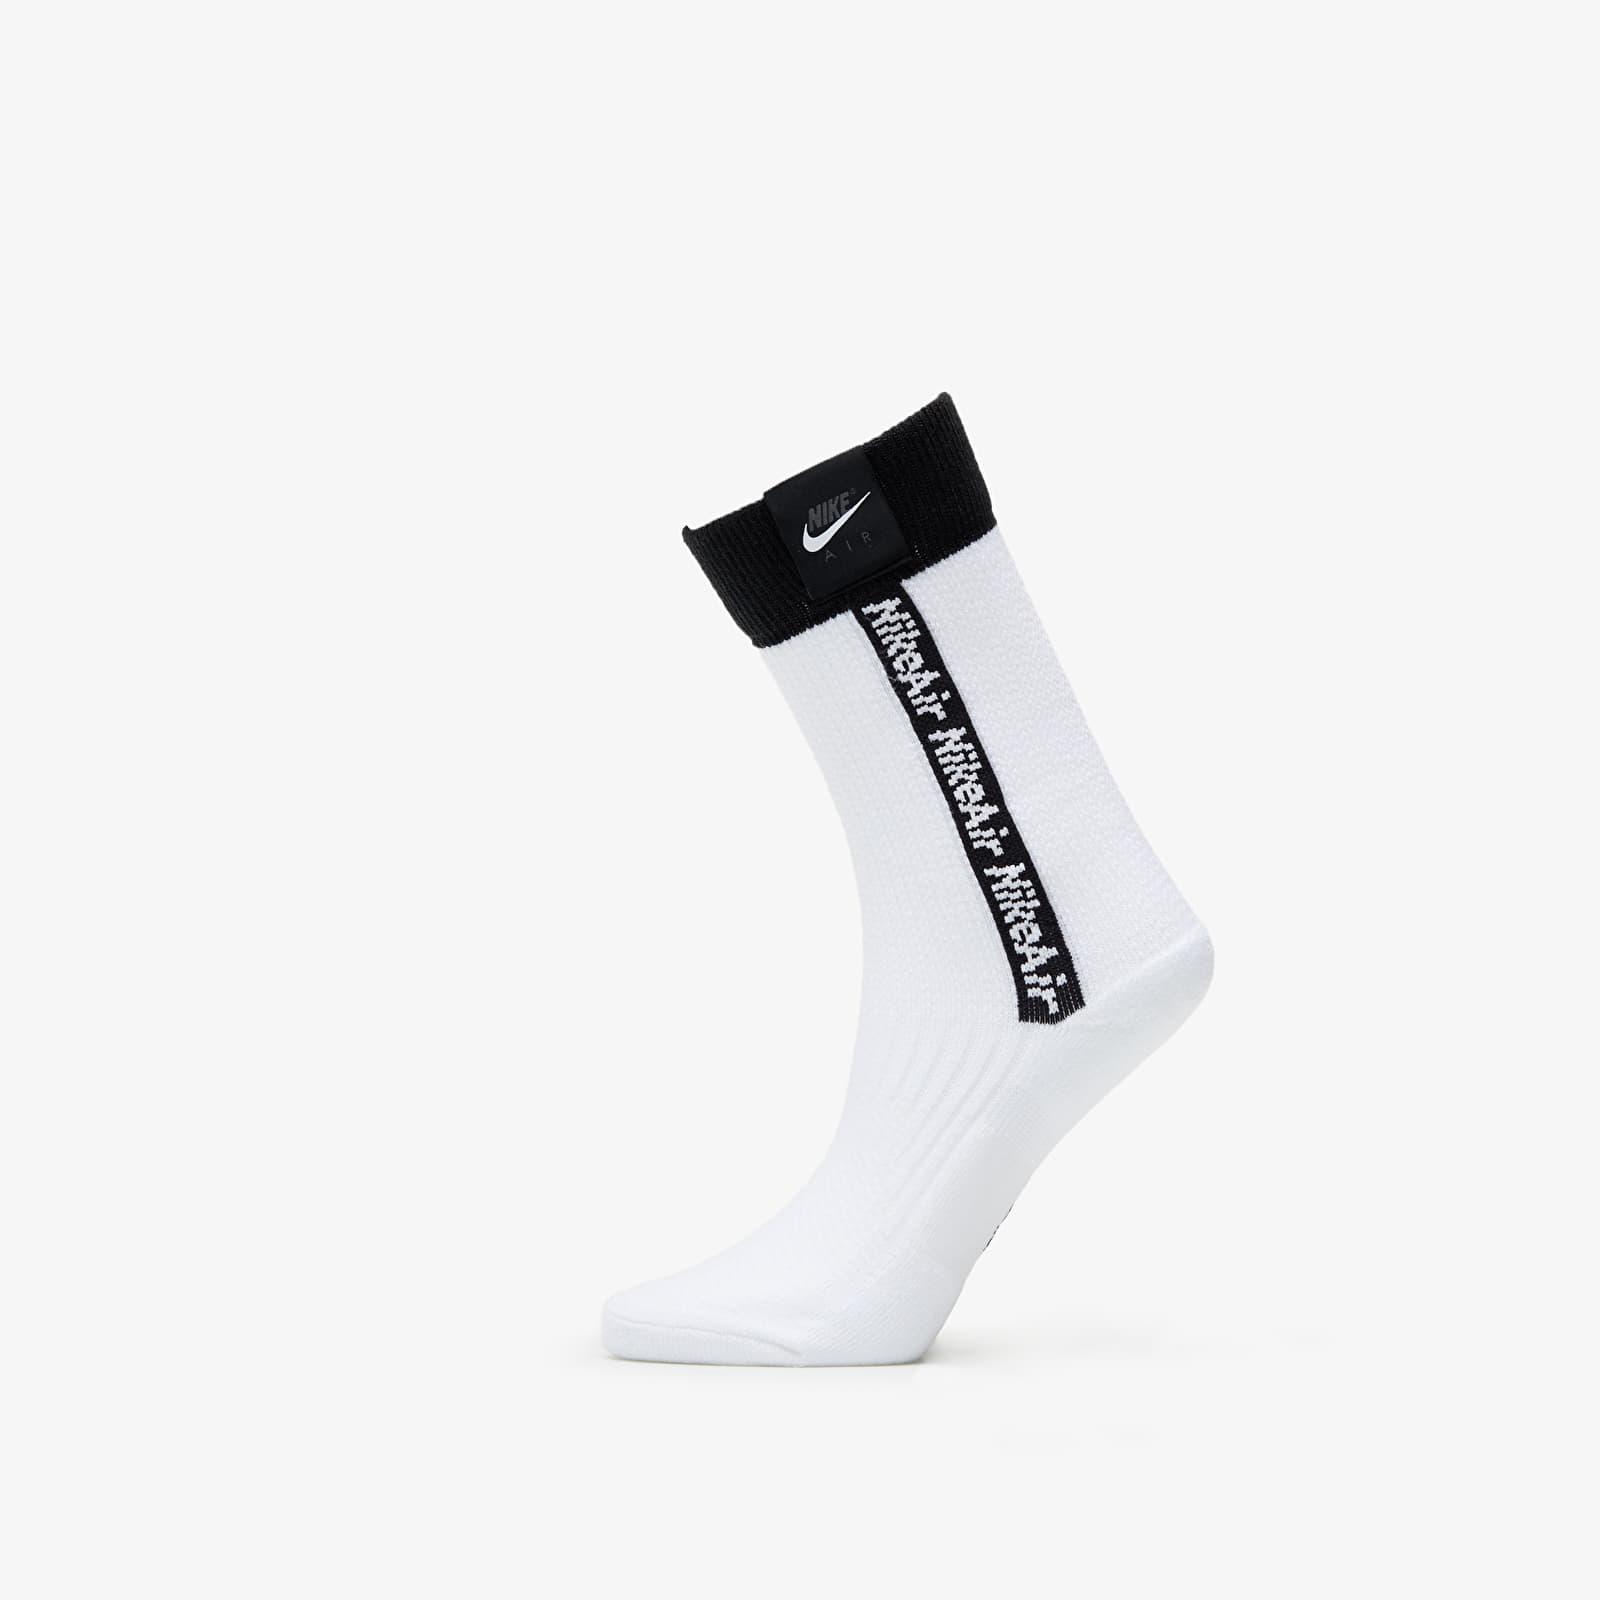 Ponožky Nike Air SNKR SOX Crew Socks (2 Pairs) Multi-Color